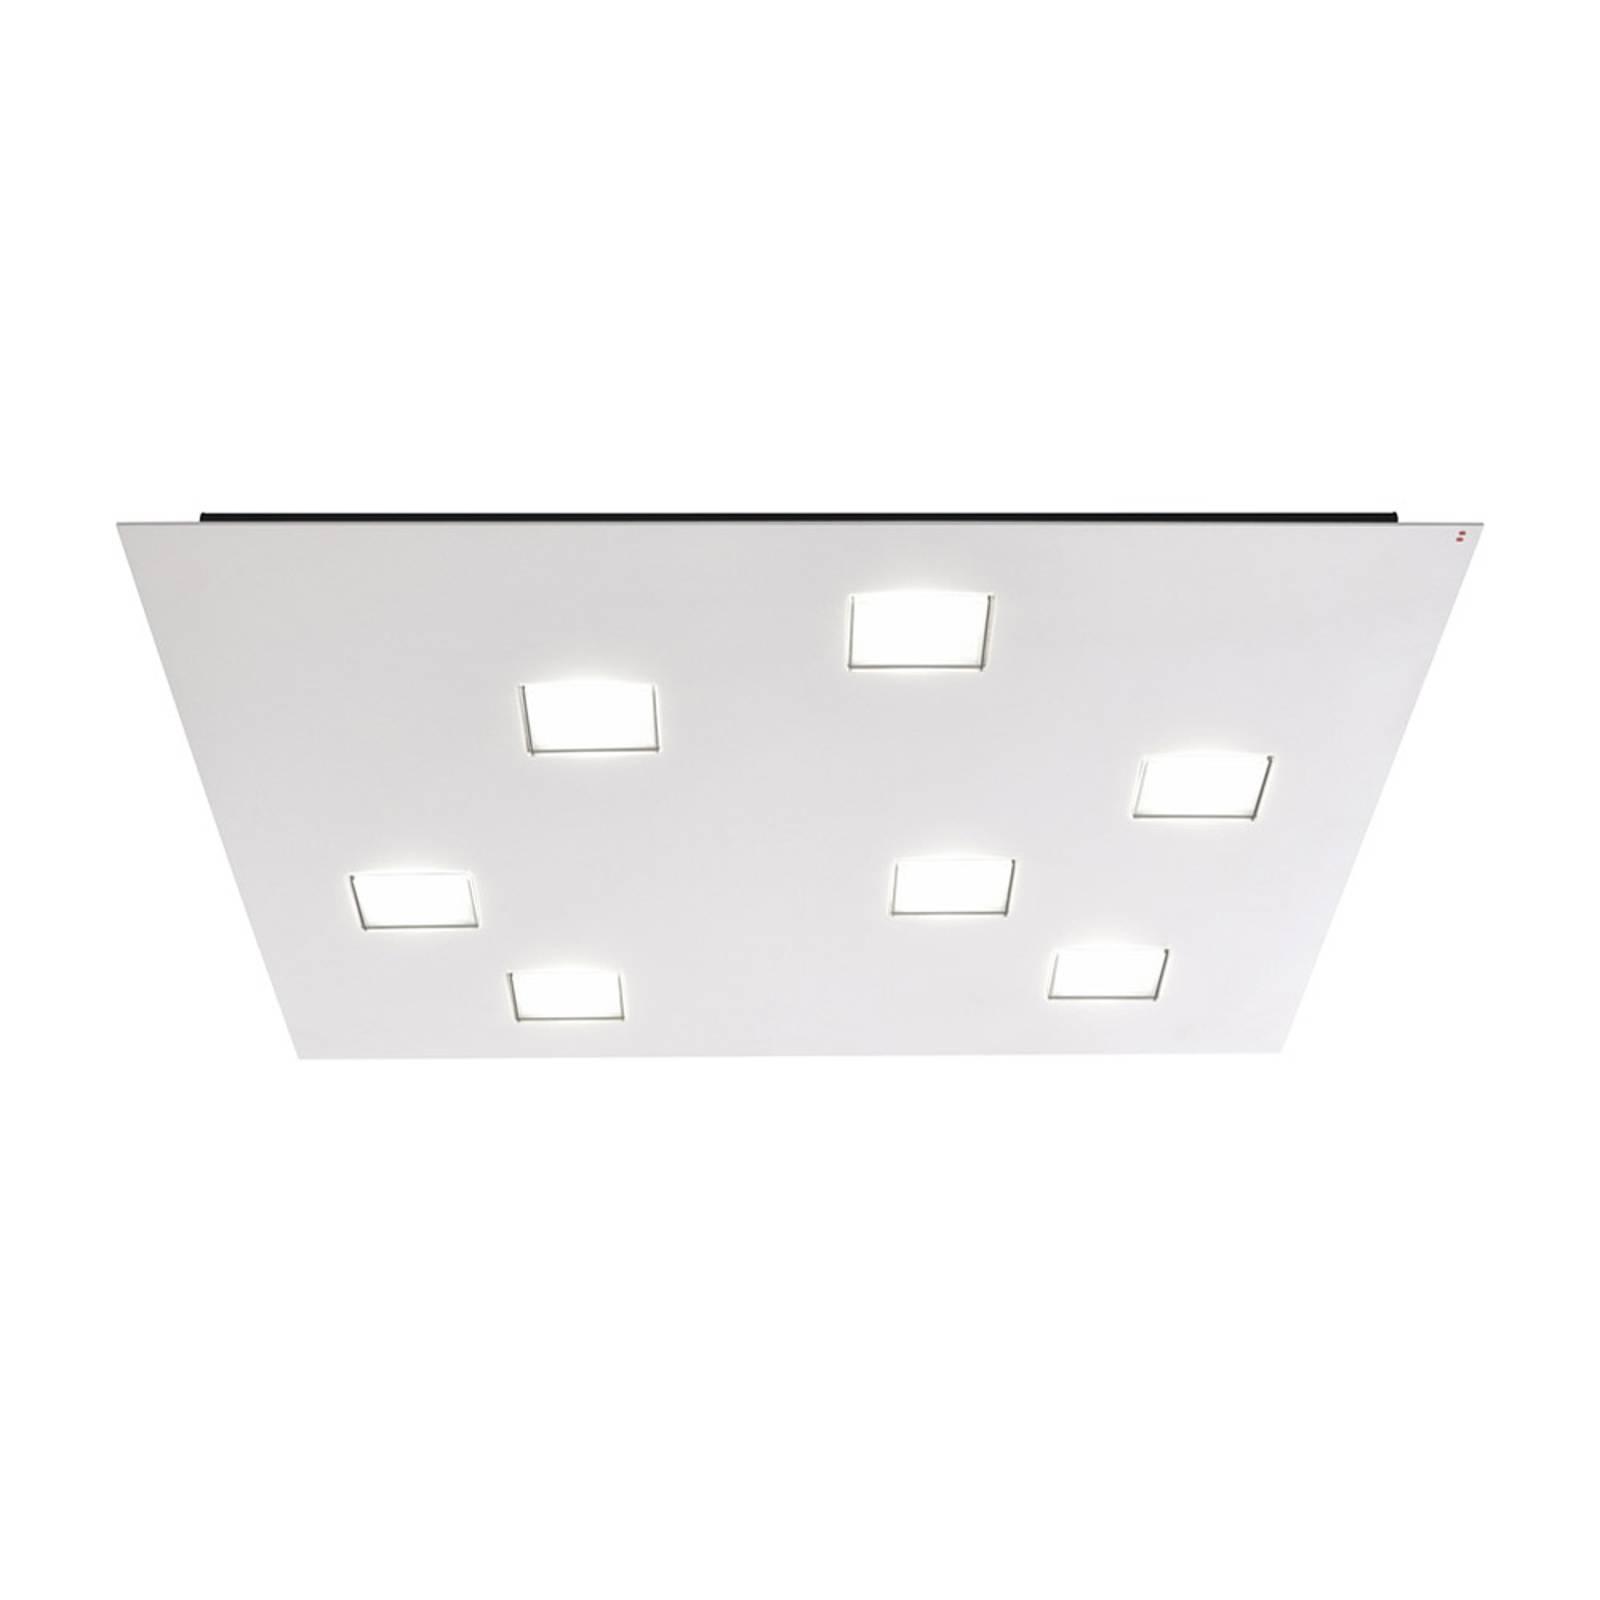 Krachtige plafondlamp Quarter in wit